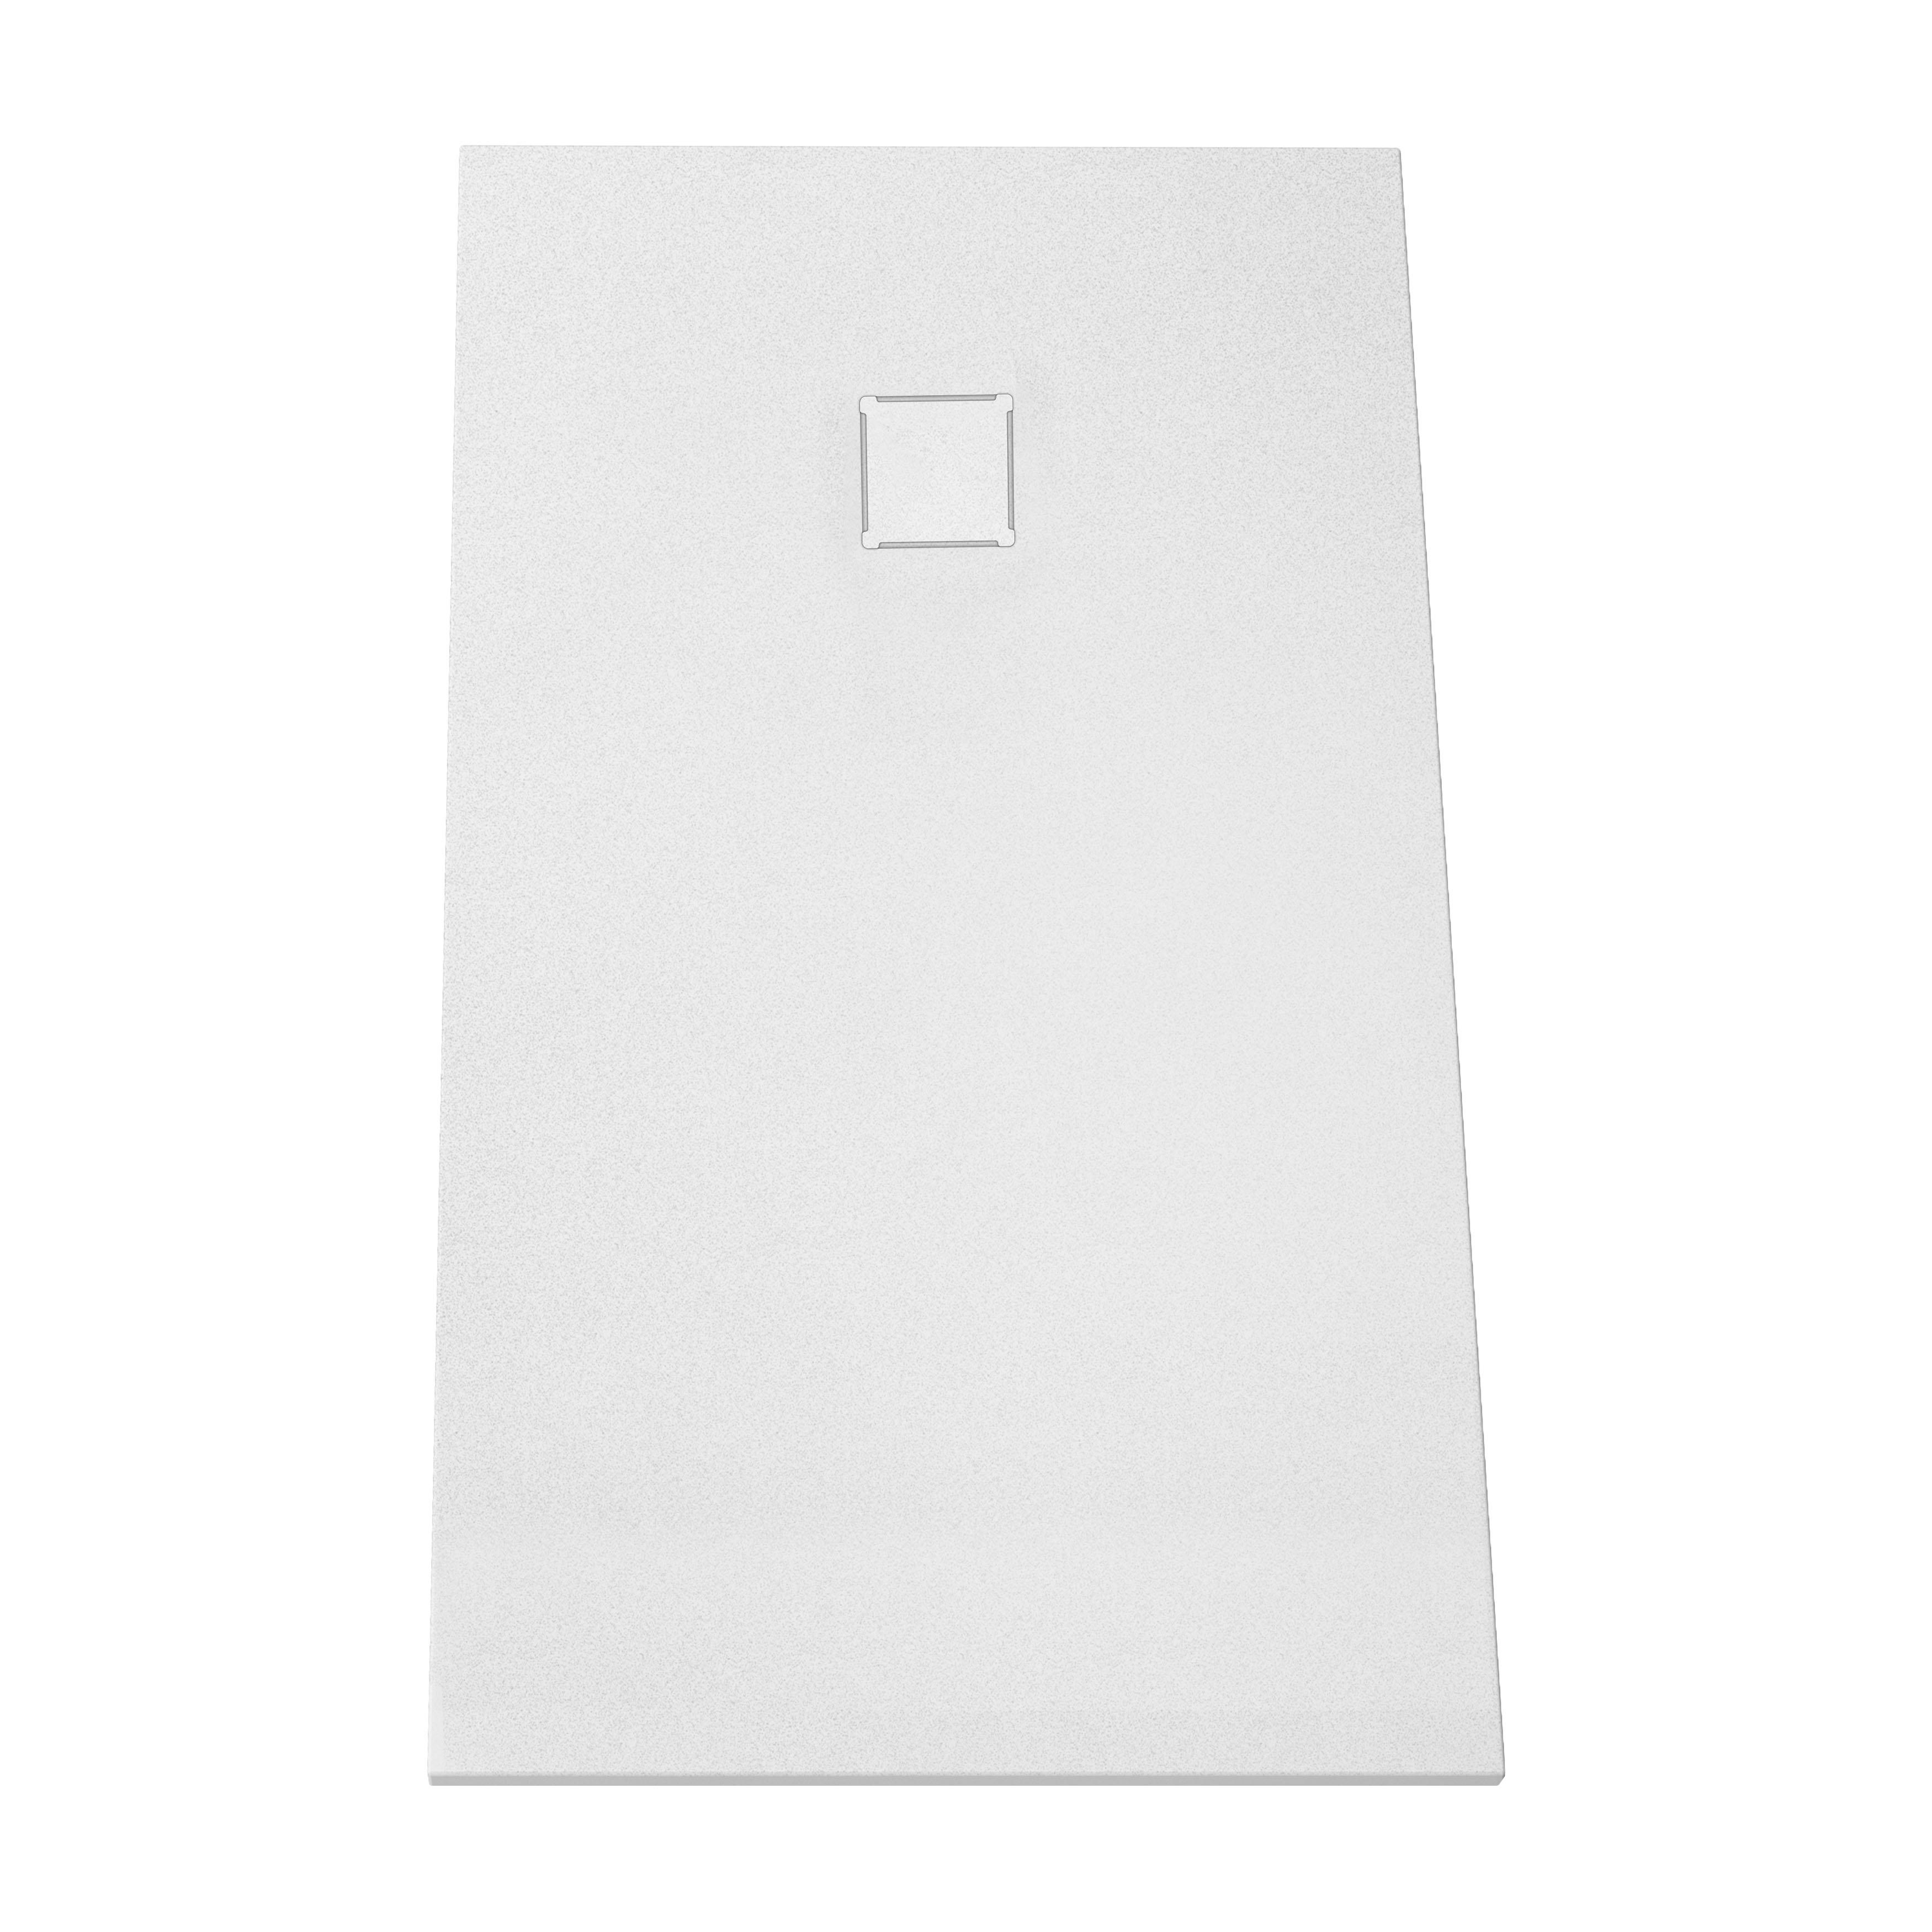 V-stone, receveur ultra plat en solid stone, 160  x  80 cm, blanc